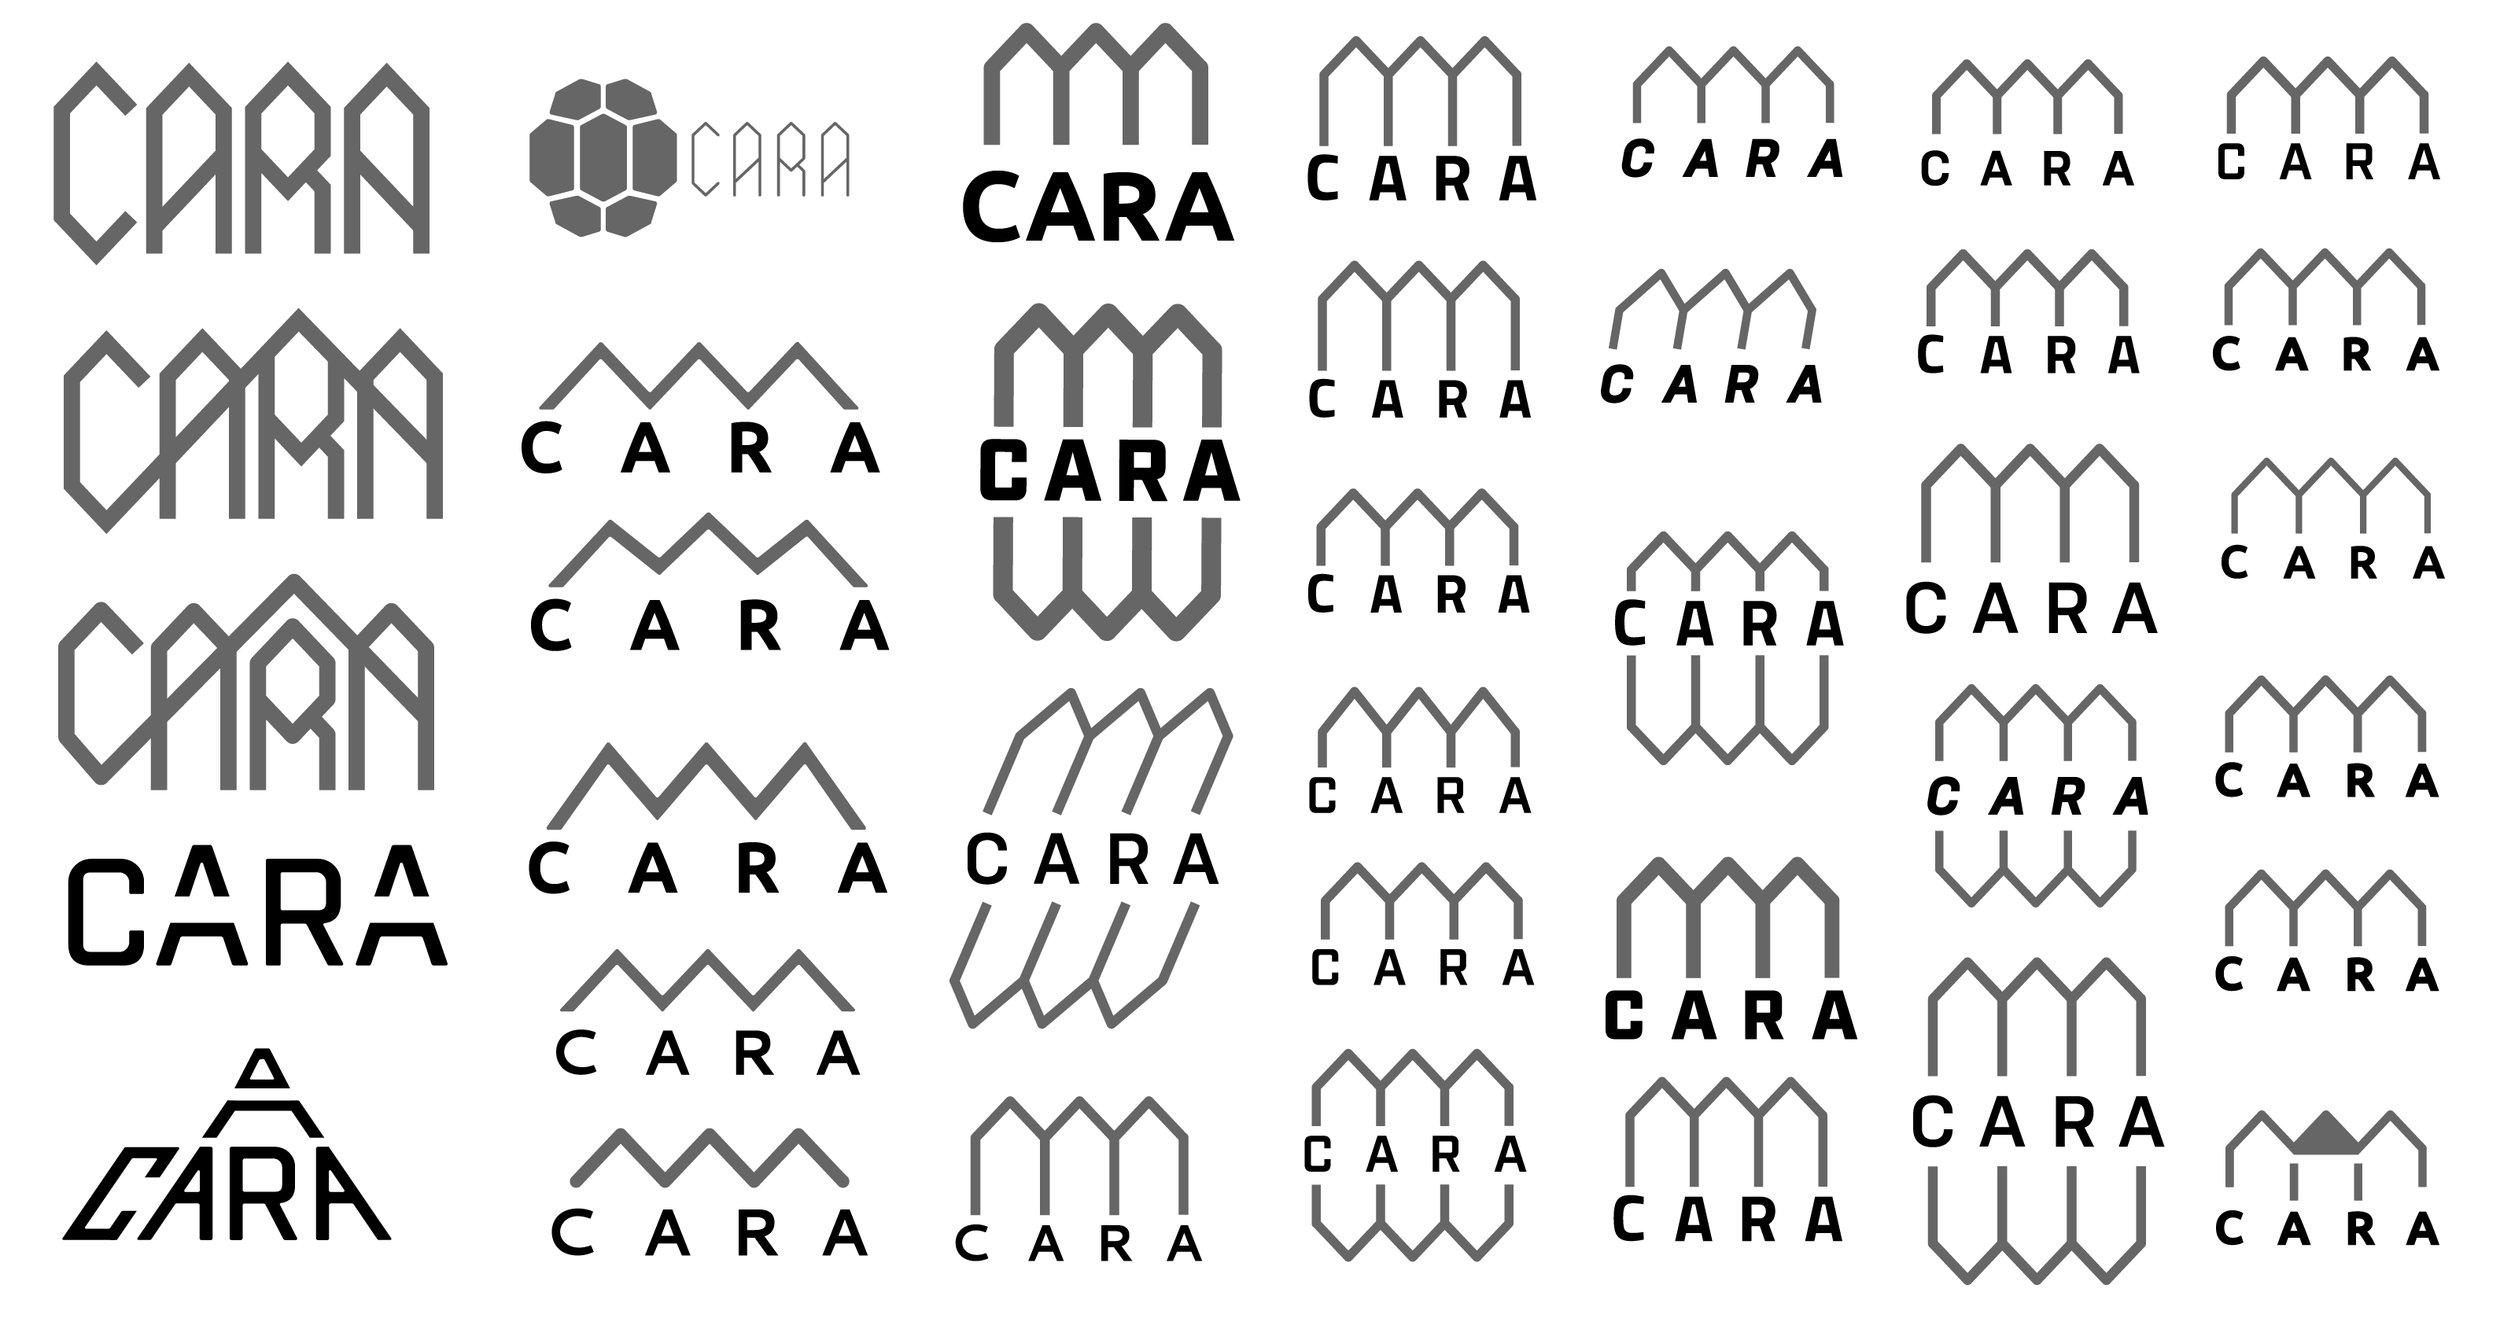 CARA_LOGO_PROGRETION-10.jpg